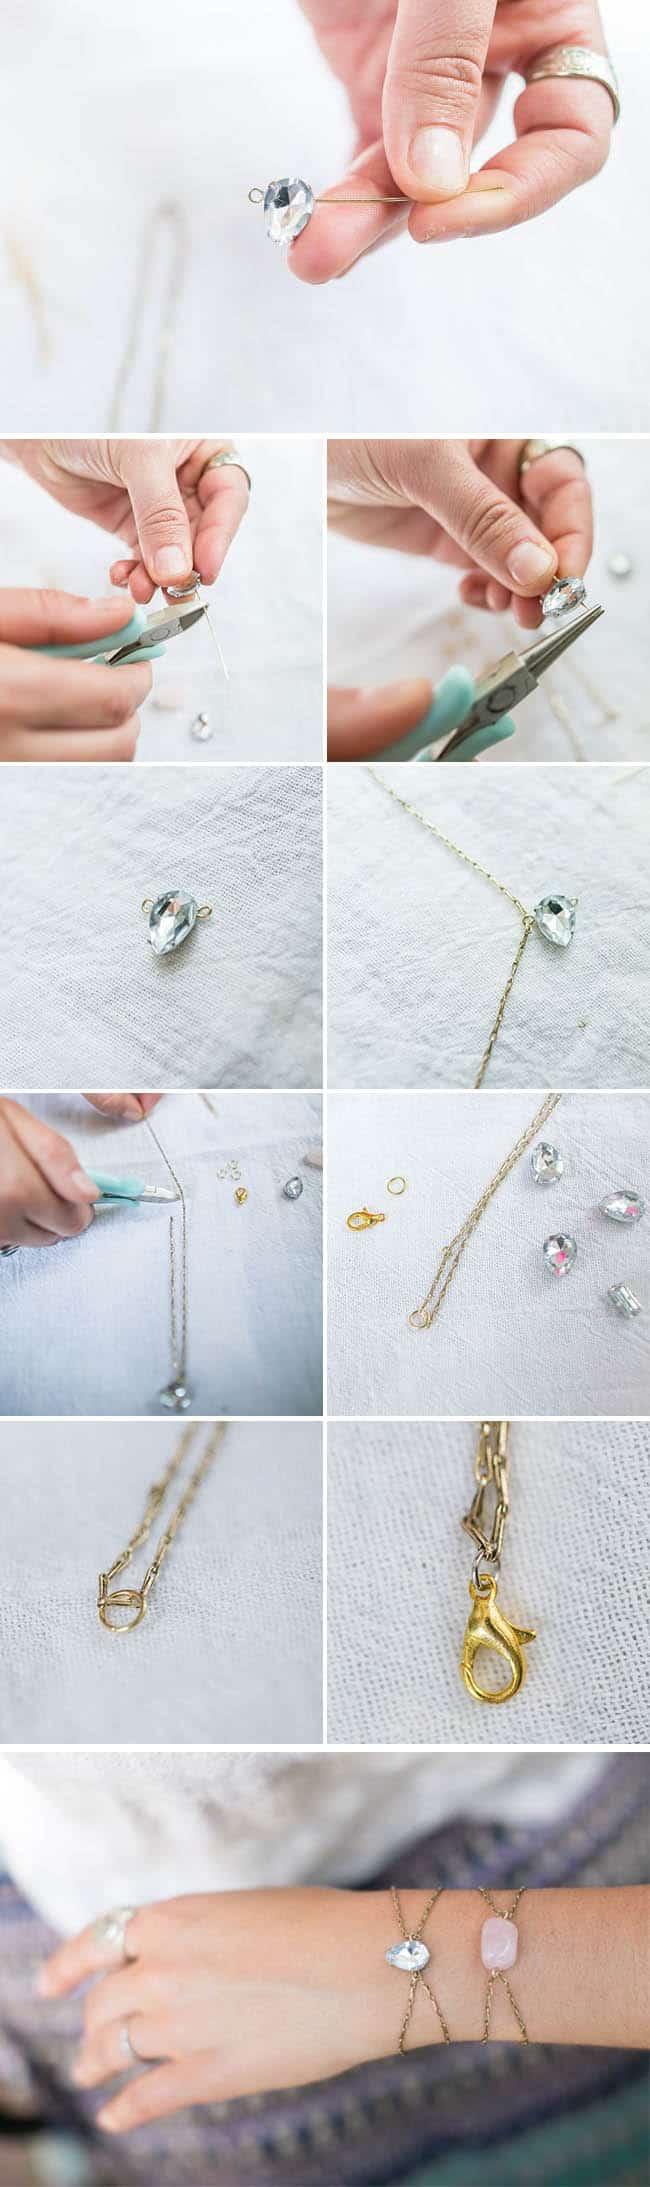 DIY Rhinestone Bracelet | HelloGlow.co